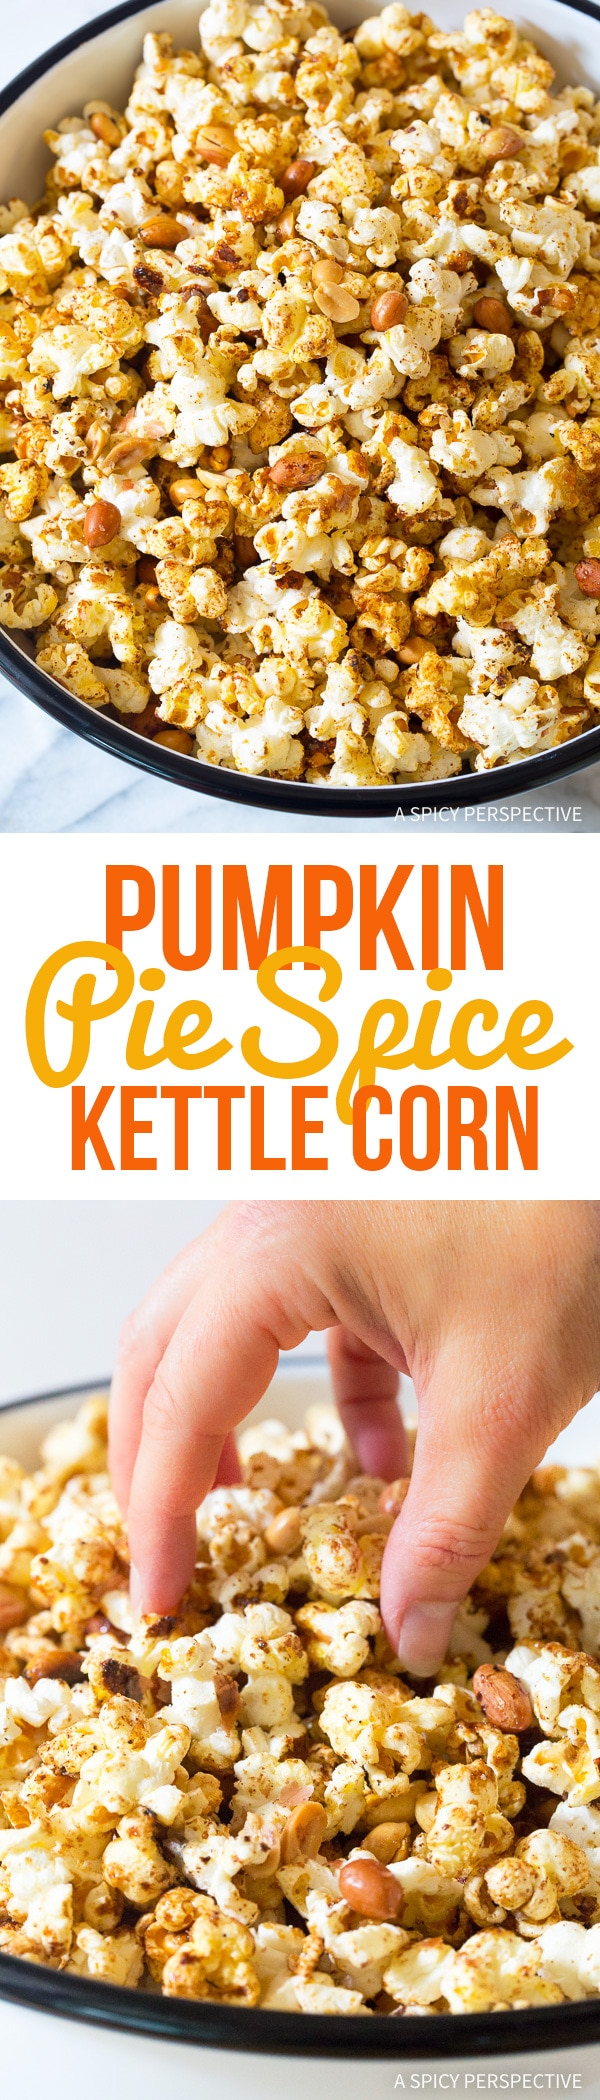 Perfect Pumpkin Pie Spice Kette Corn Recipe